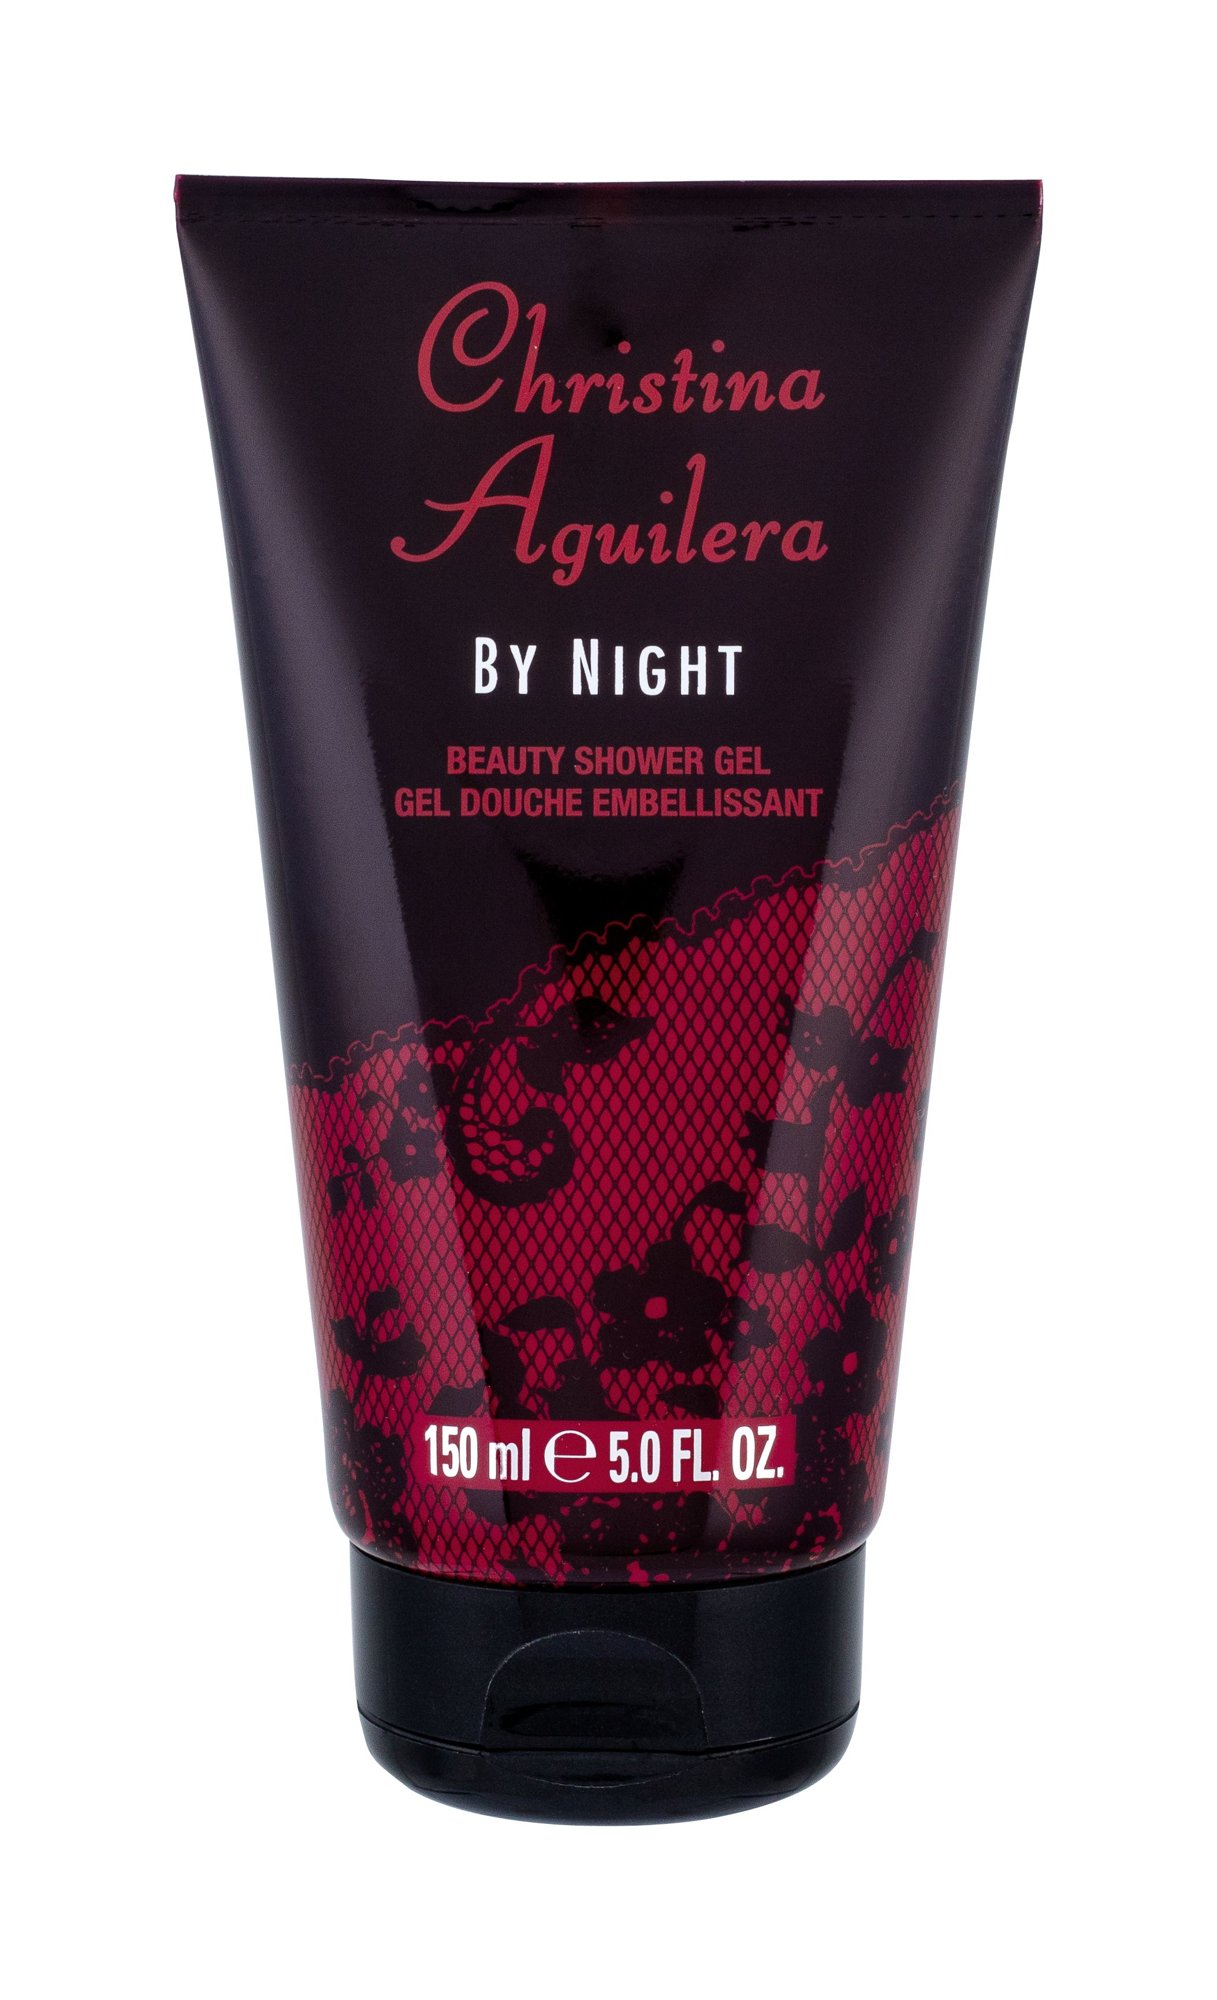 Christina Aguilera Christina Aguilera by Night Shower Gel 150ml